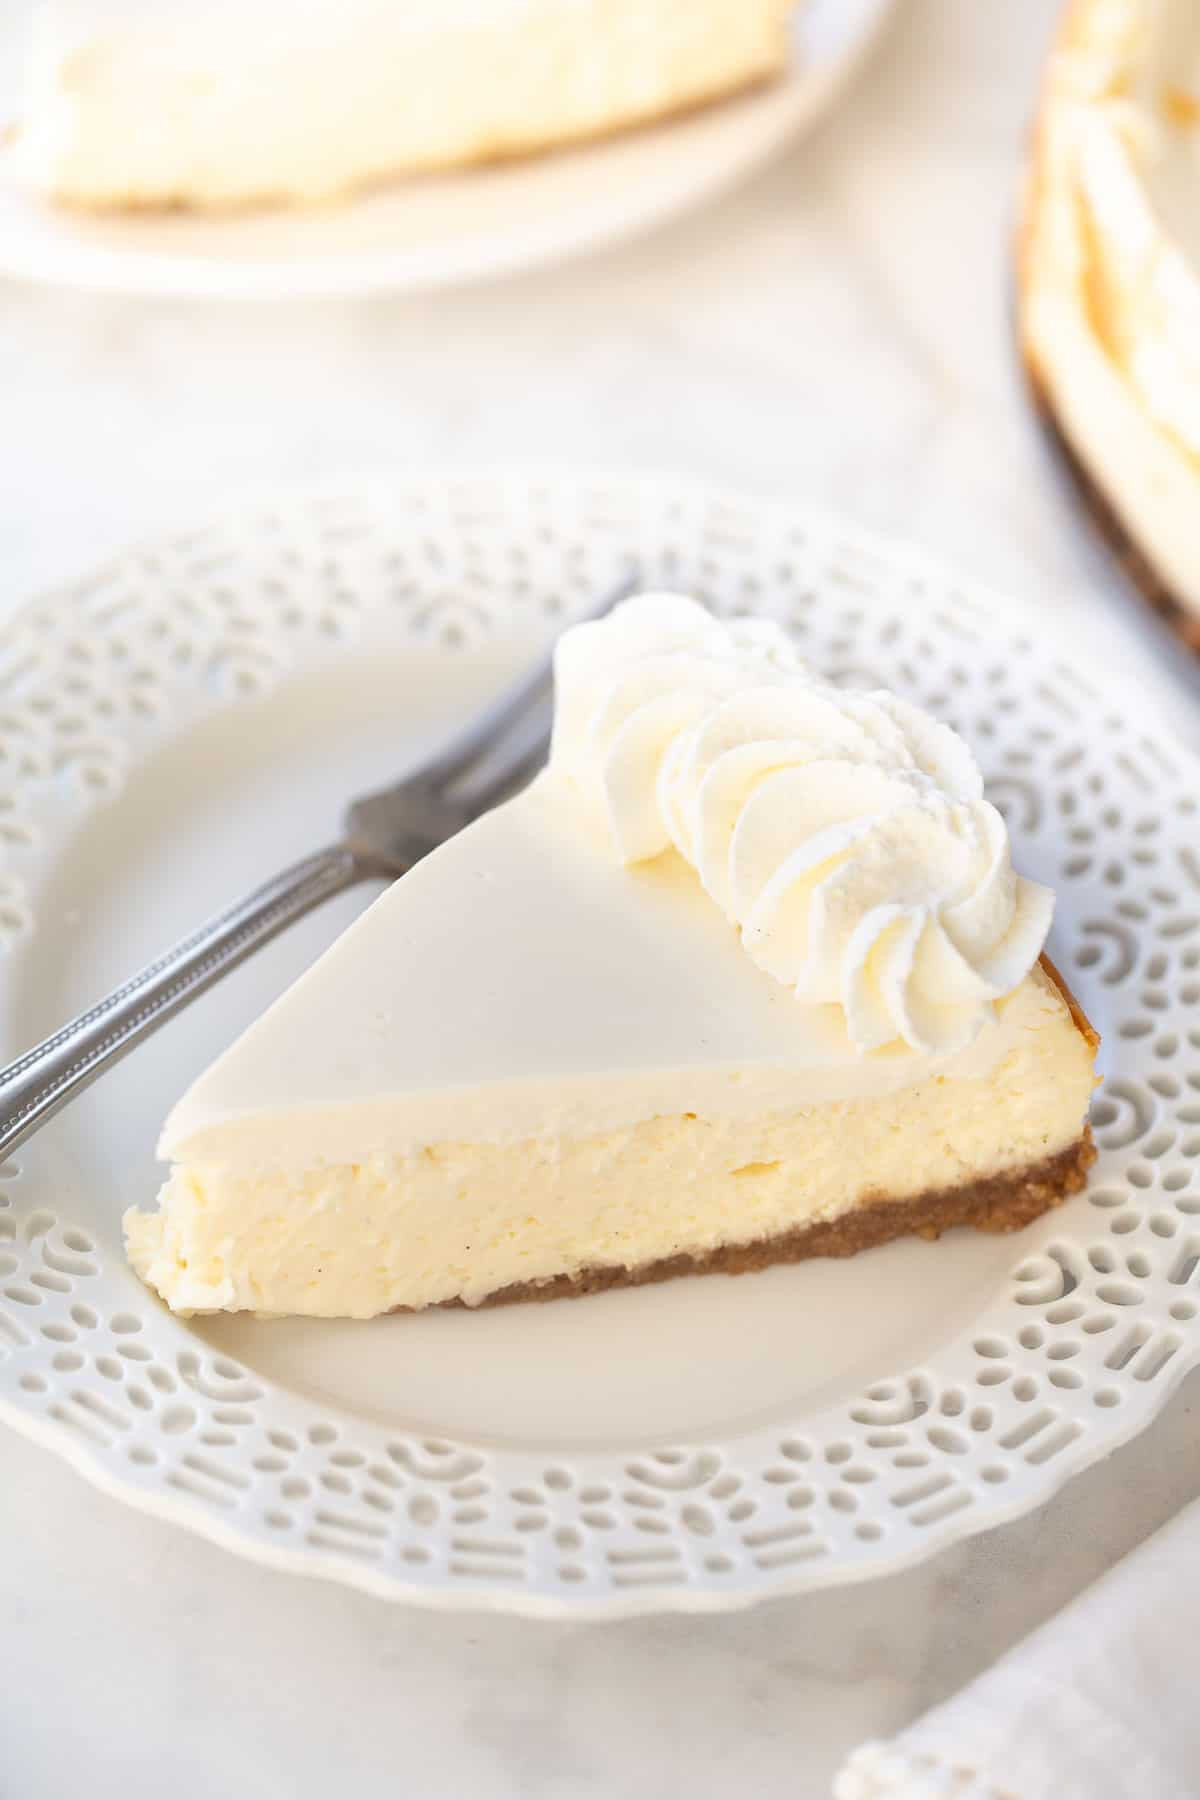 photo de cheesecake sur assiette blanche